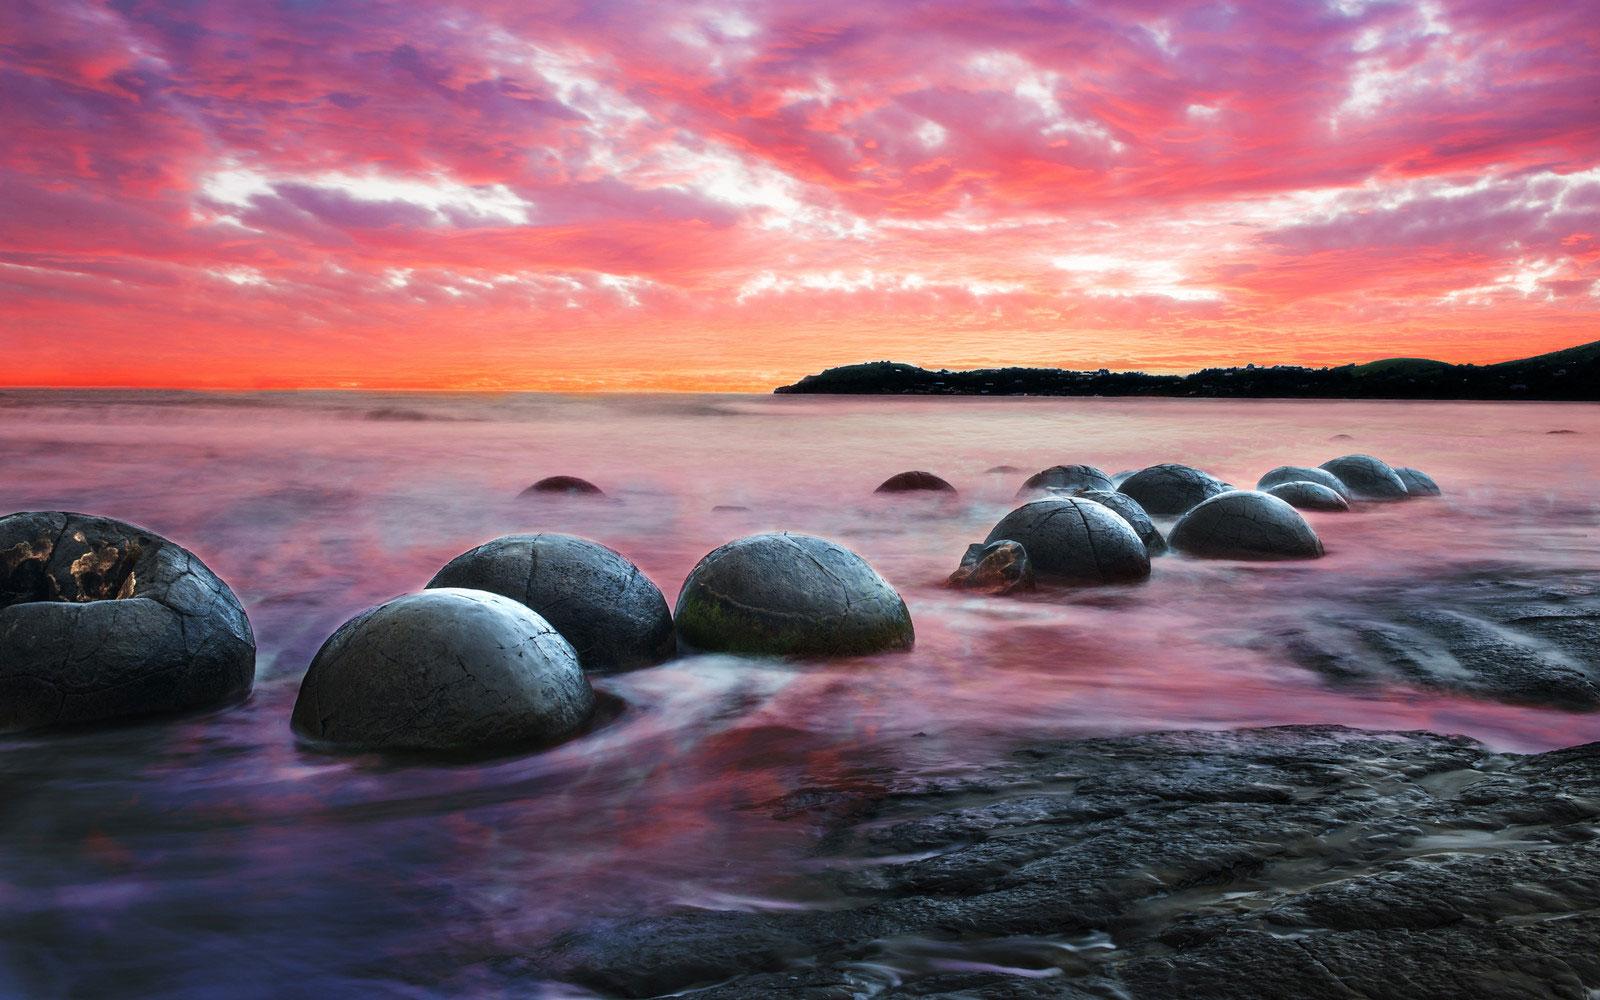 spherical-boulders-in-new-zealand_natural-phenomena